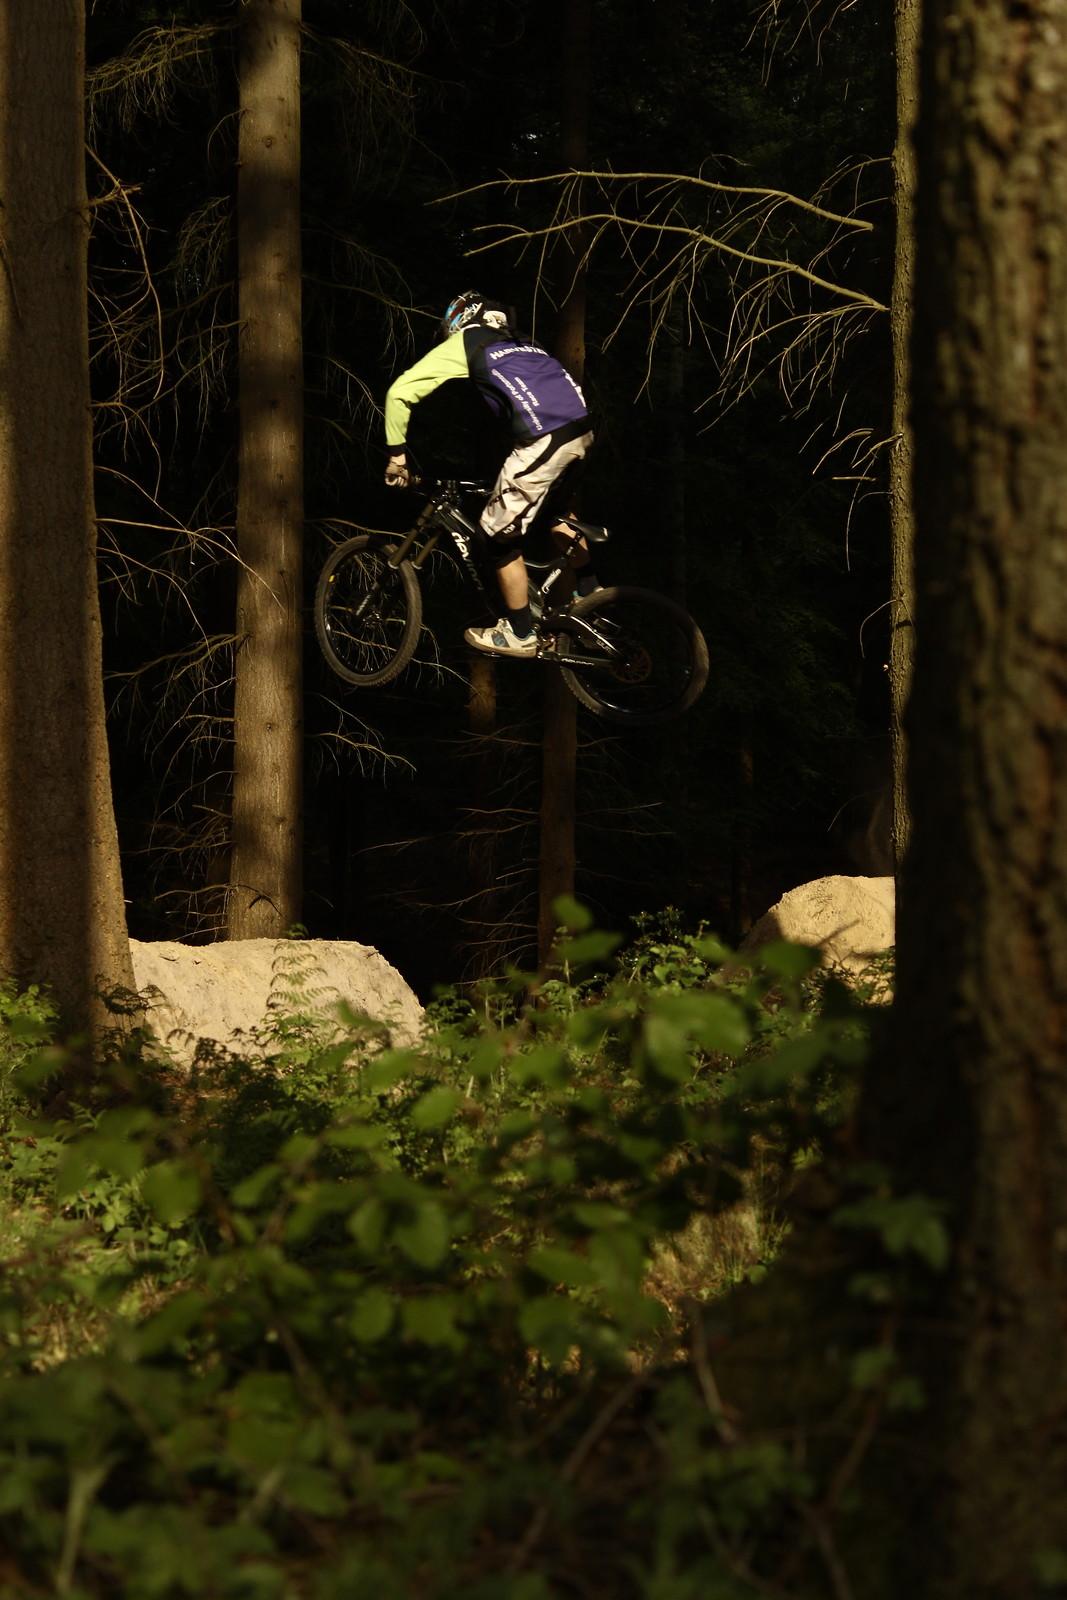 Dave Harvey - bikematter - Mountain Biking Pictures - Vital MTB